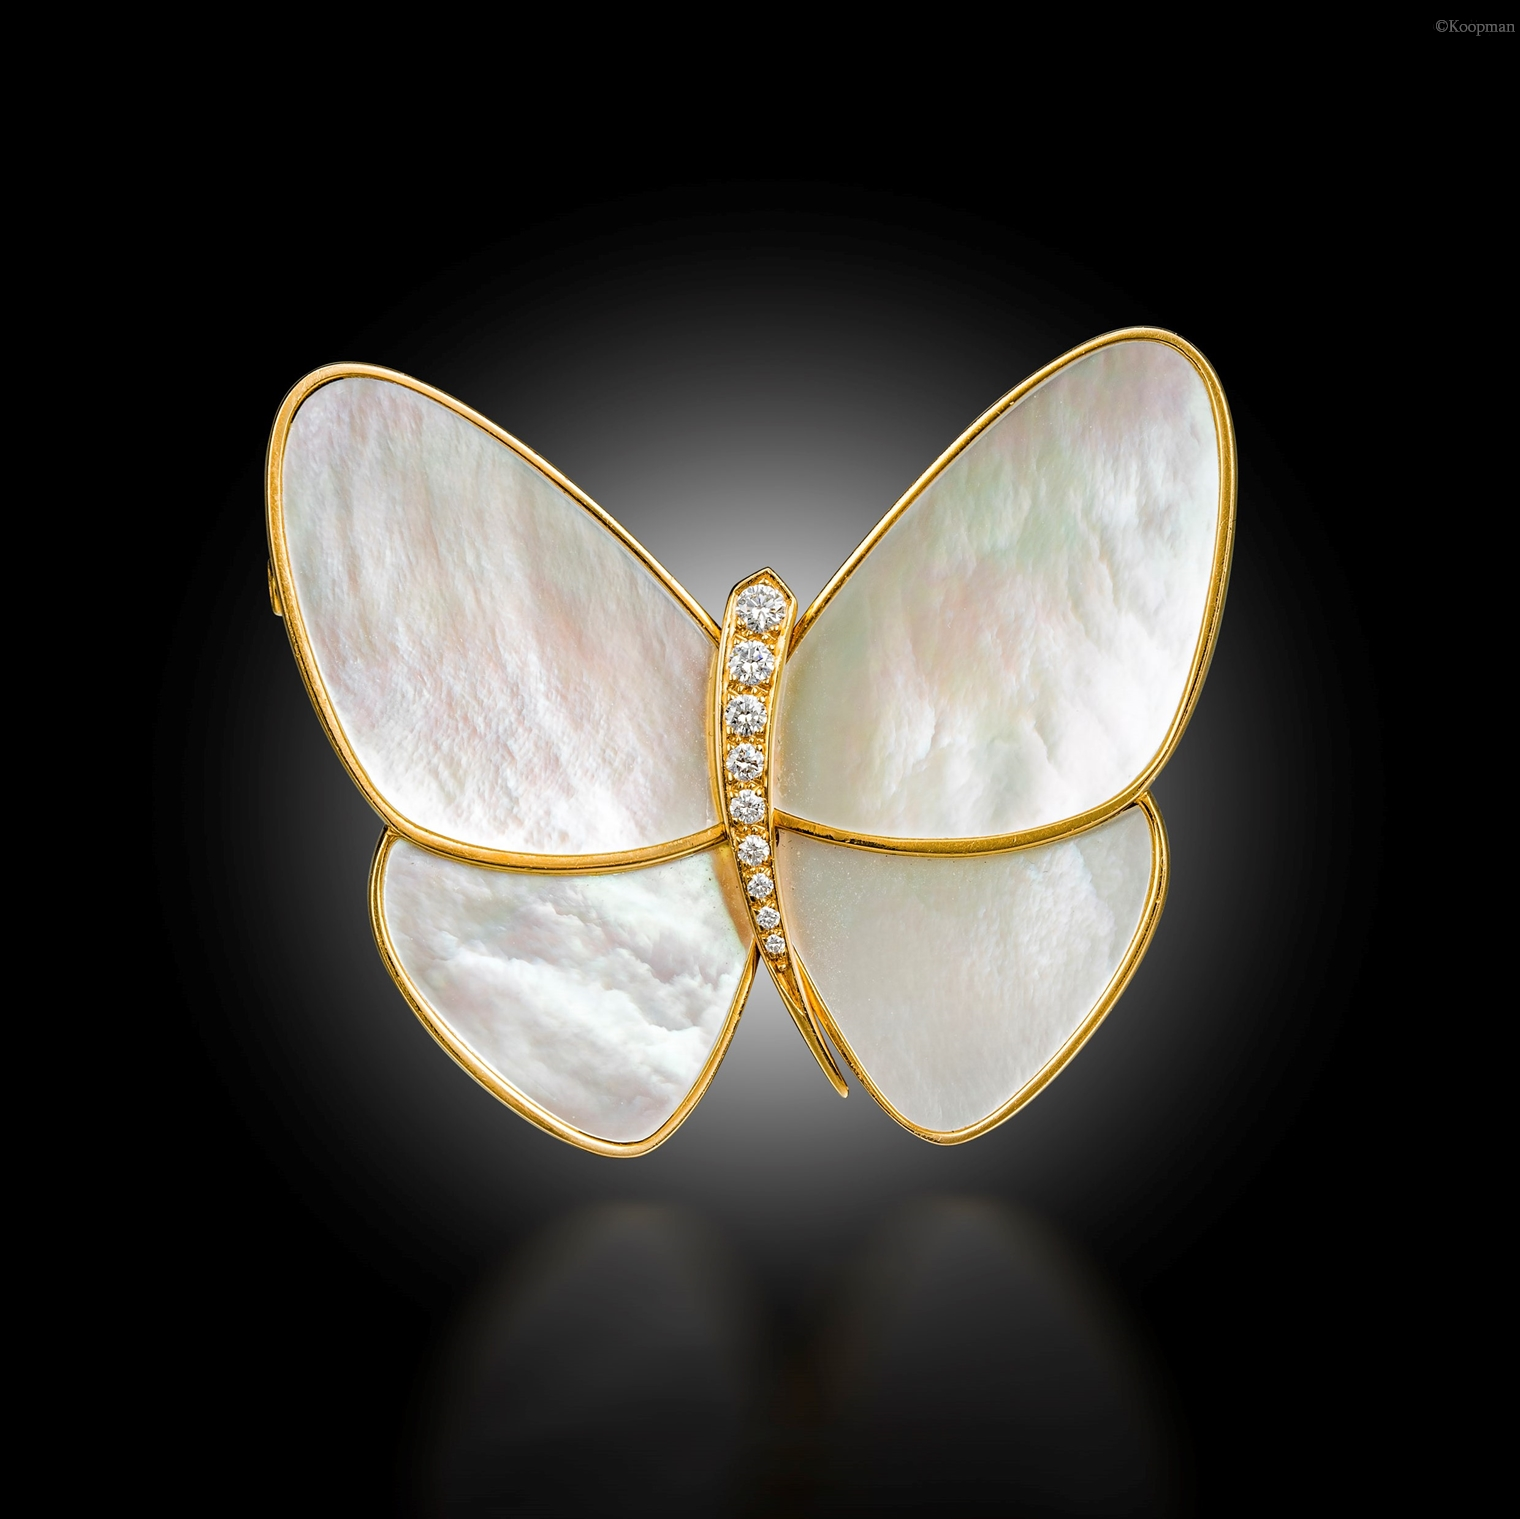 A Butterfly Clip Brooch